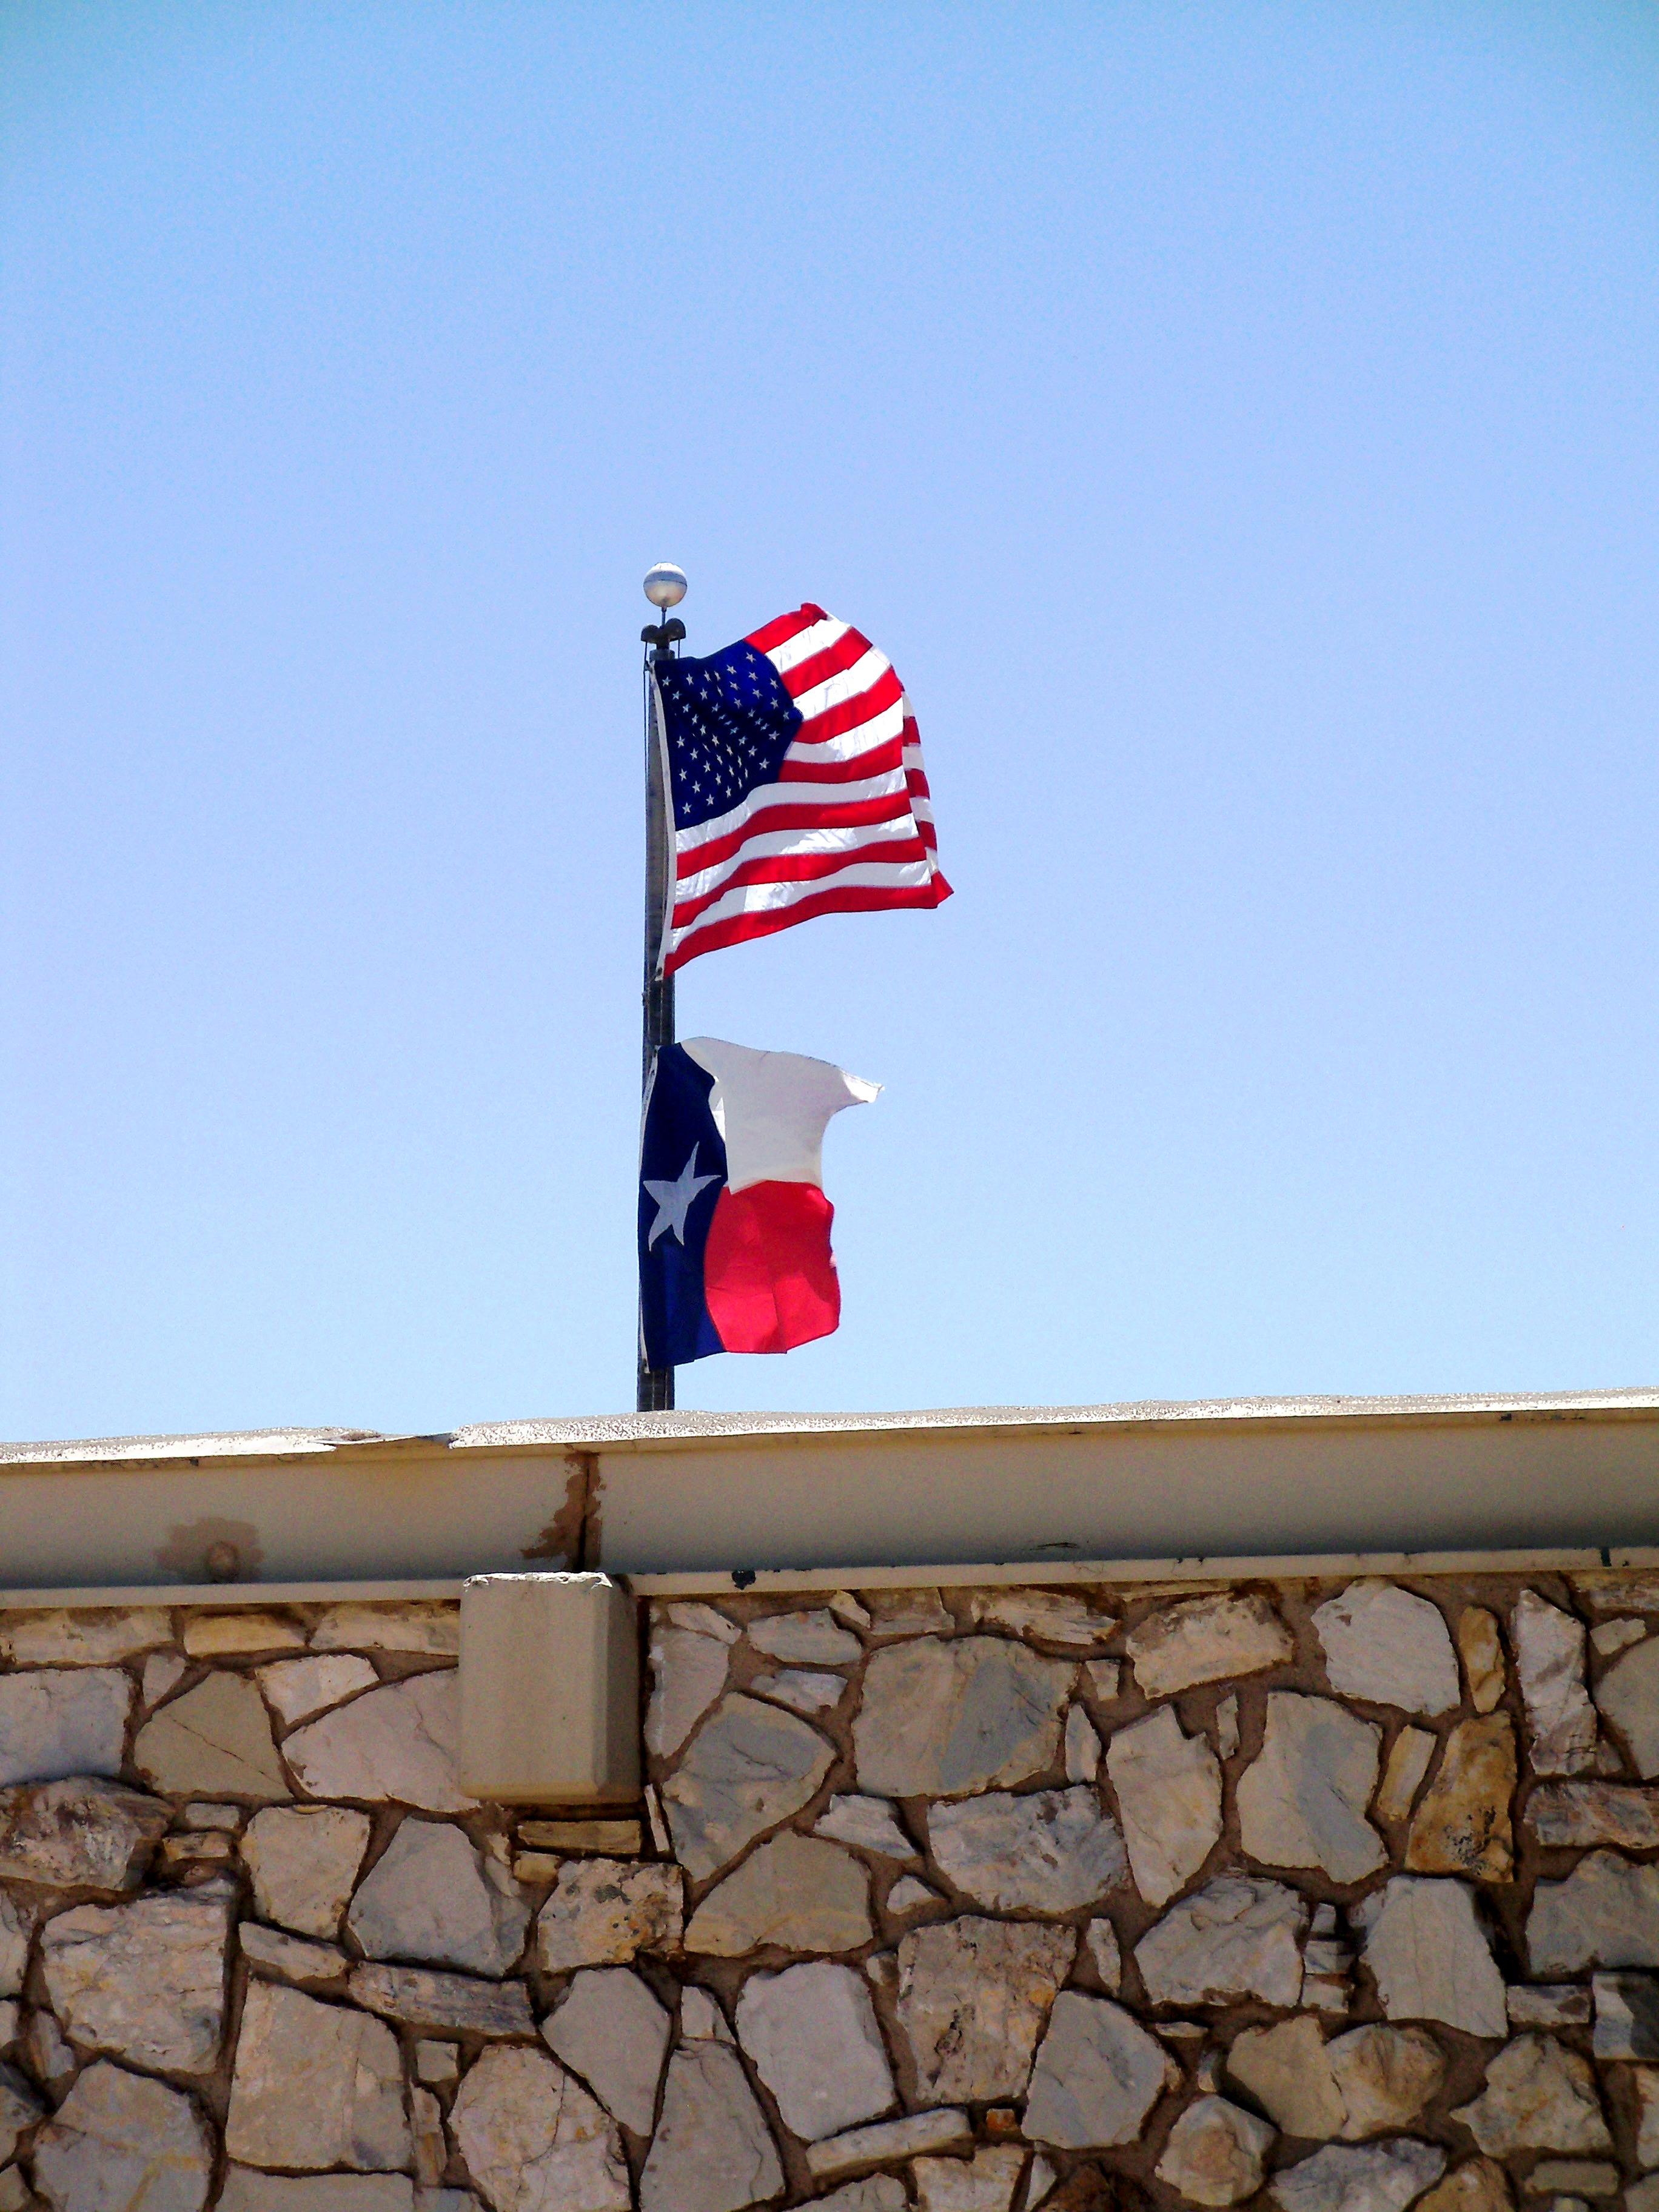 Incontri a Wichita Falls Texas